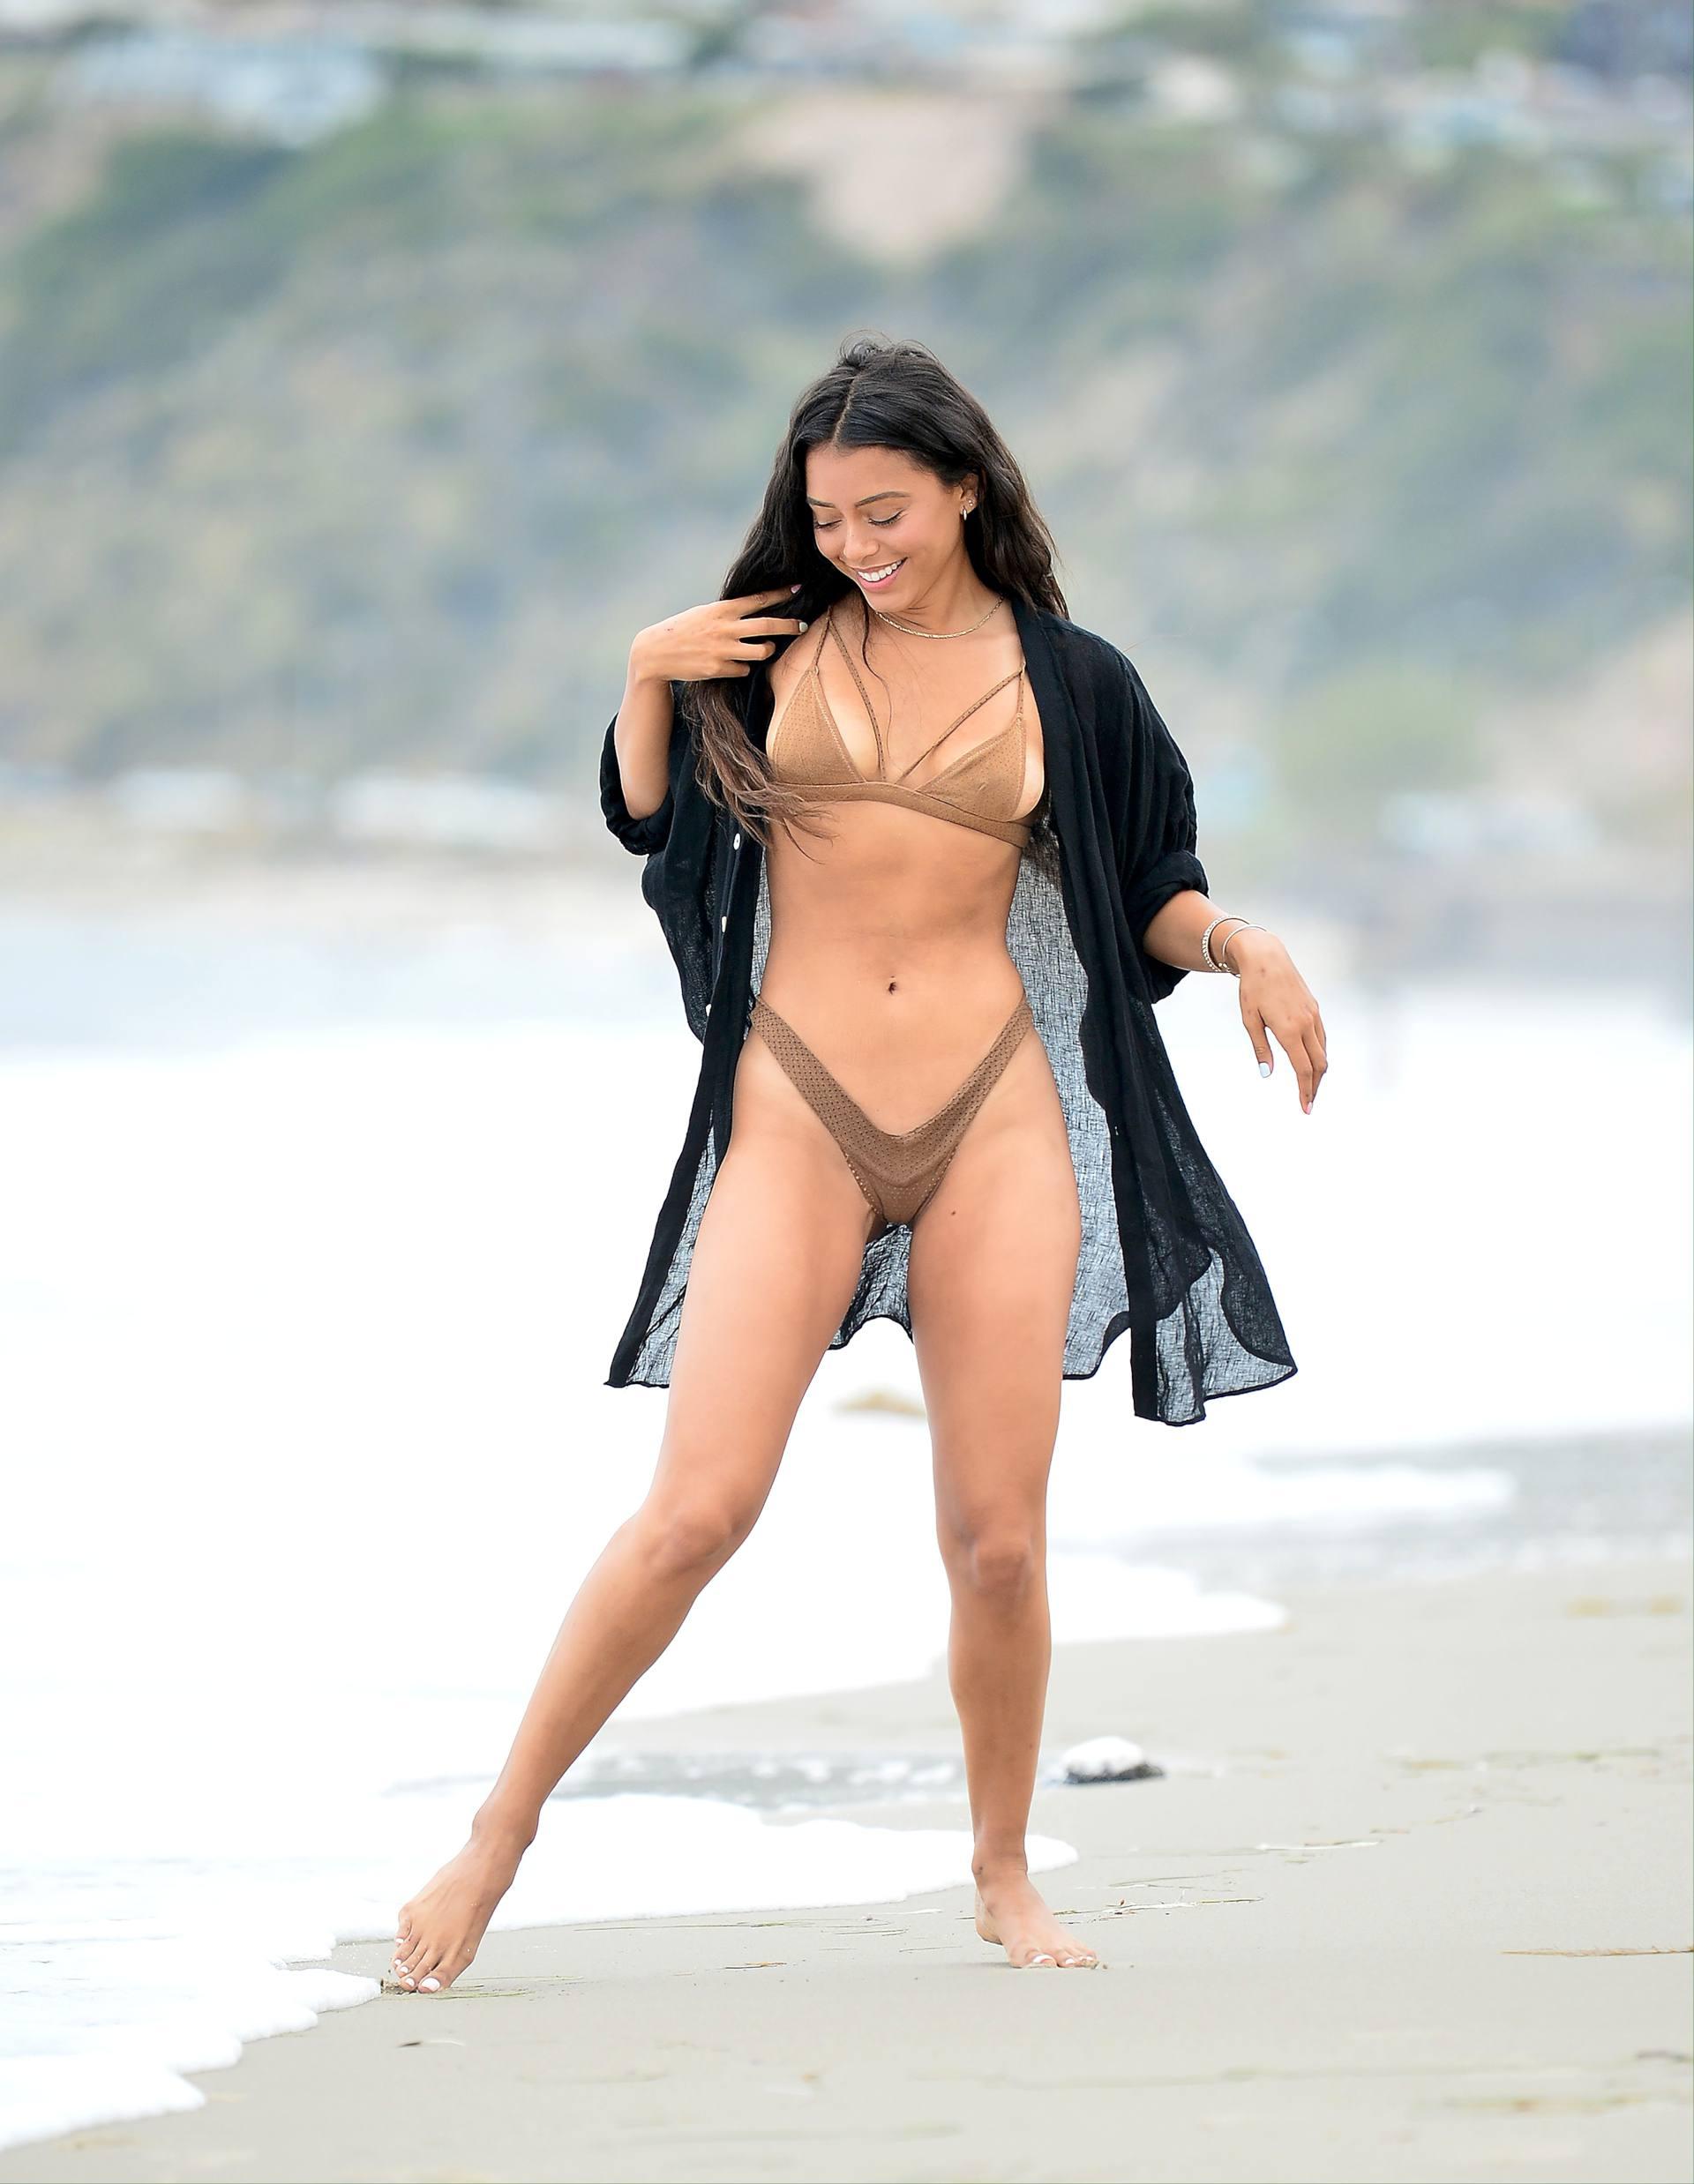 Michelle Hayden – Sexy Body In Tiny Bikini On The Beach In Malibu 0007